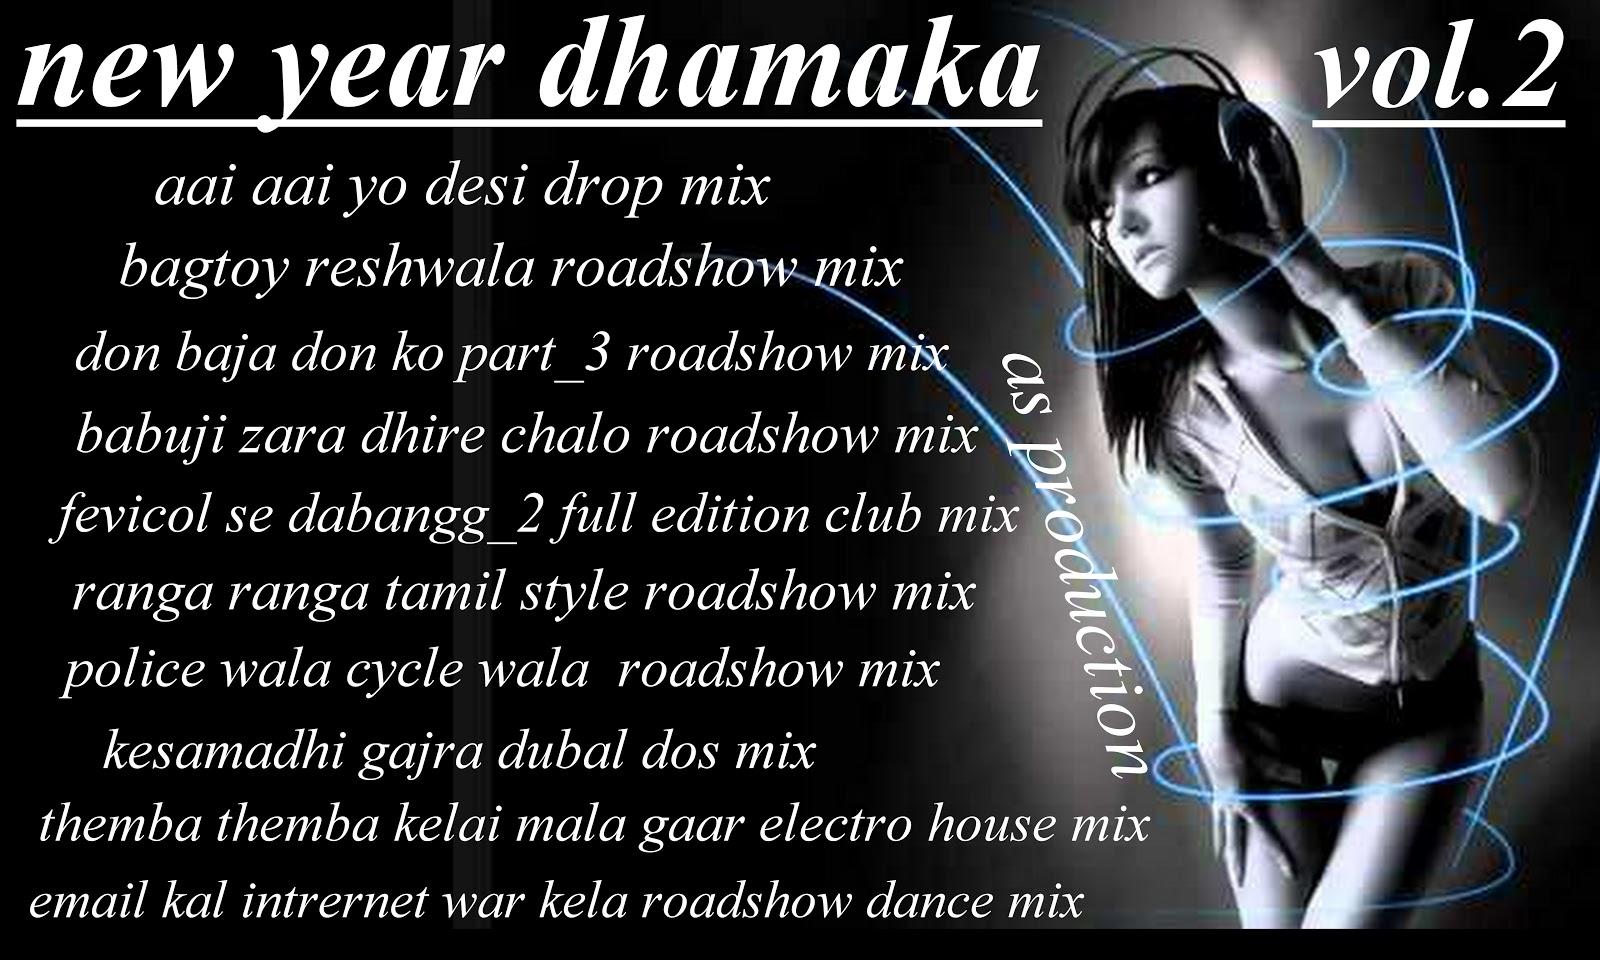 DjBuvA com: New Year Dhamaka Vol 2 :: Dj Atul Pune